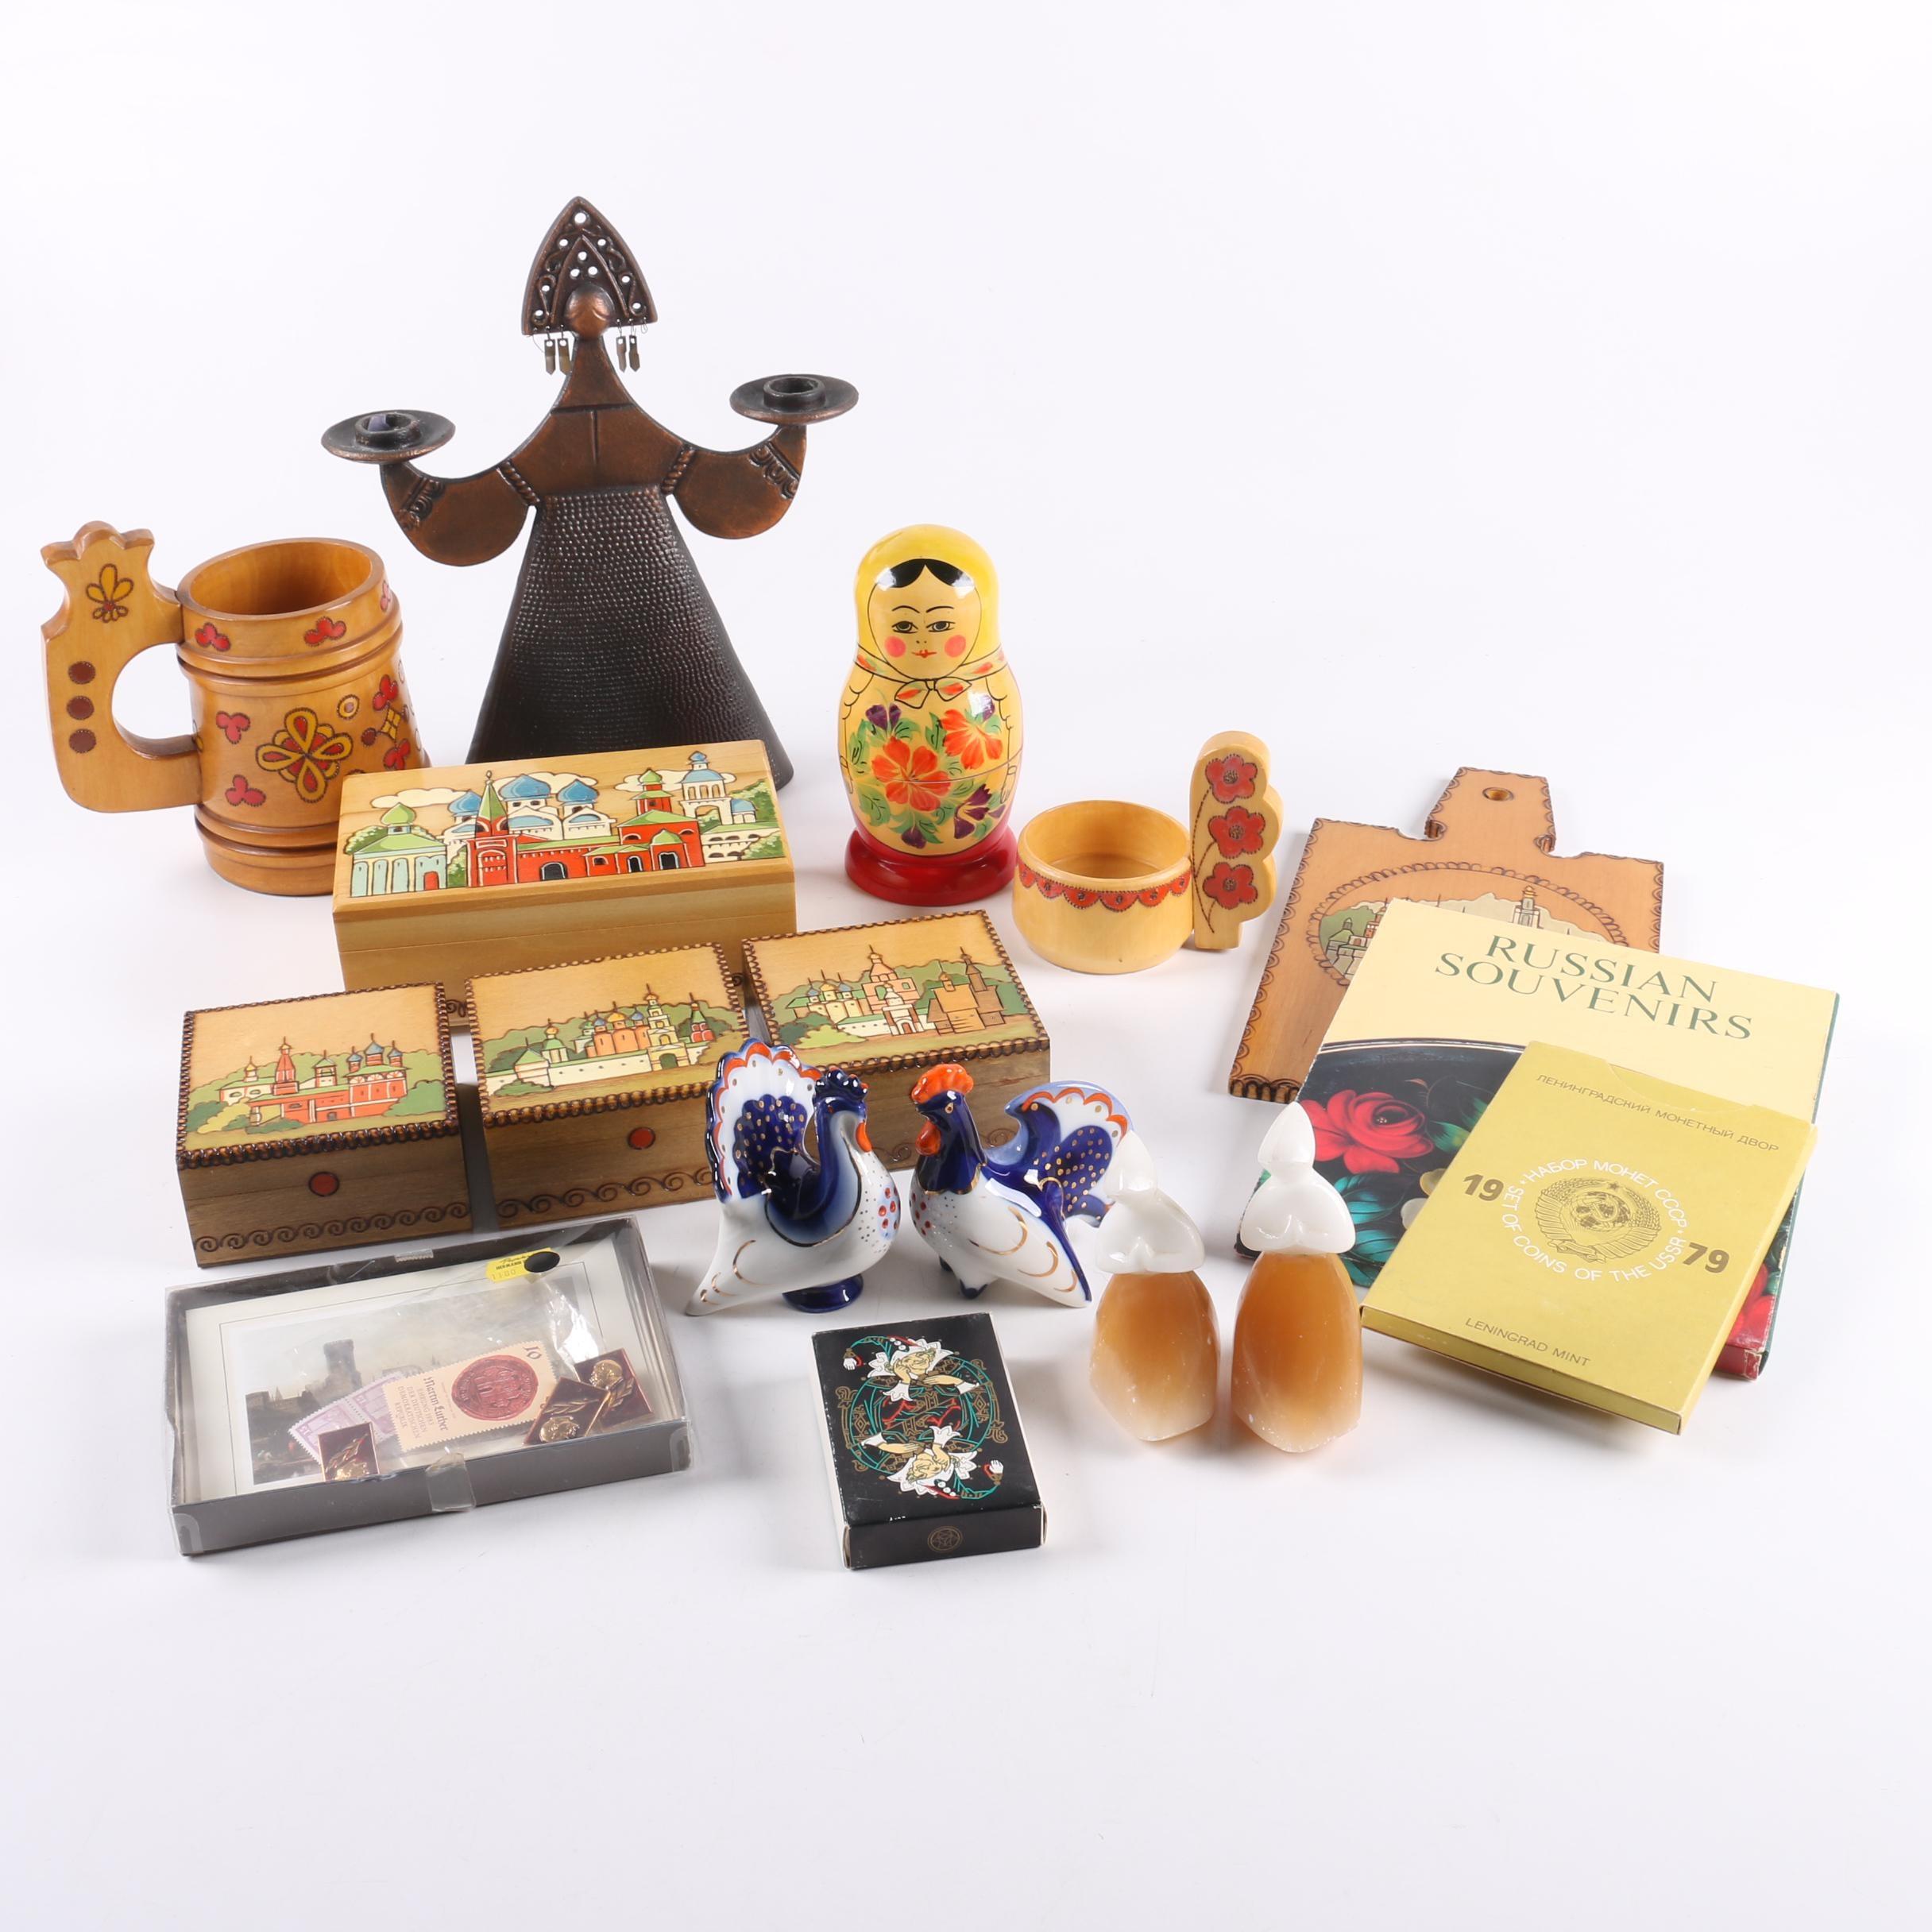 Russian Folk Souvenirs Including Matryoshka Doll